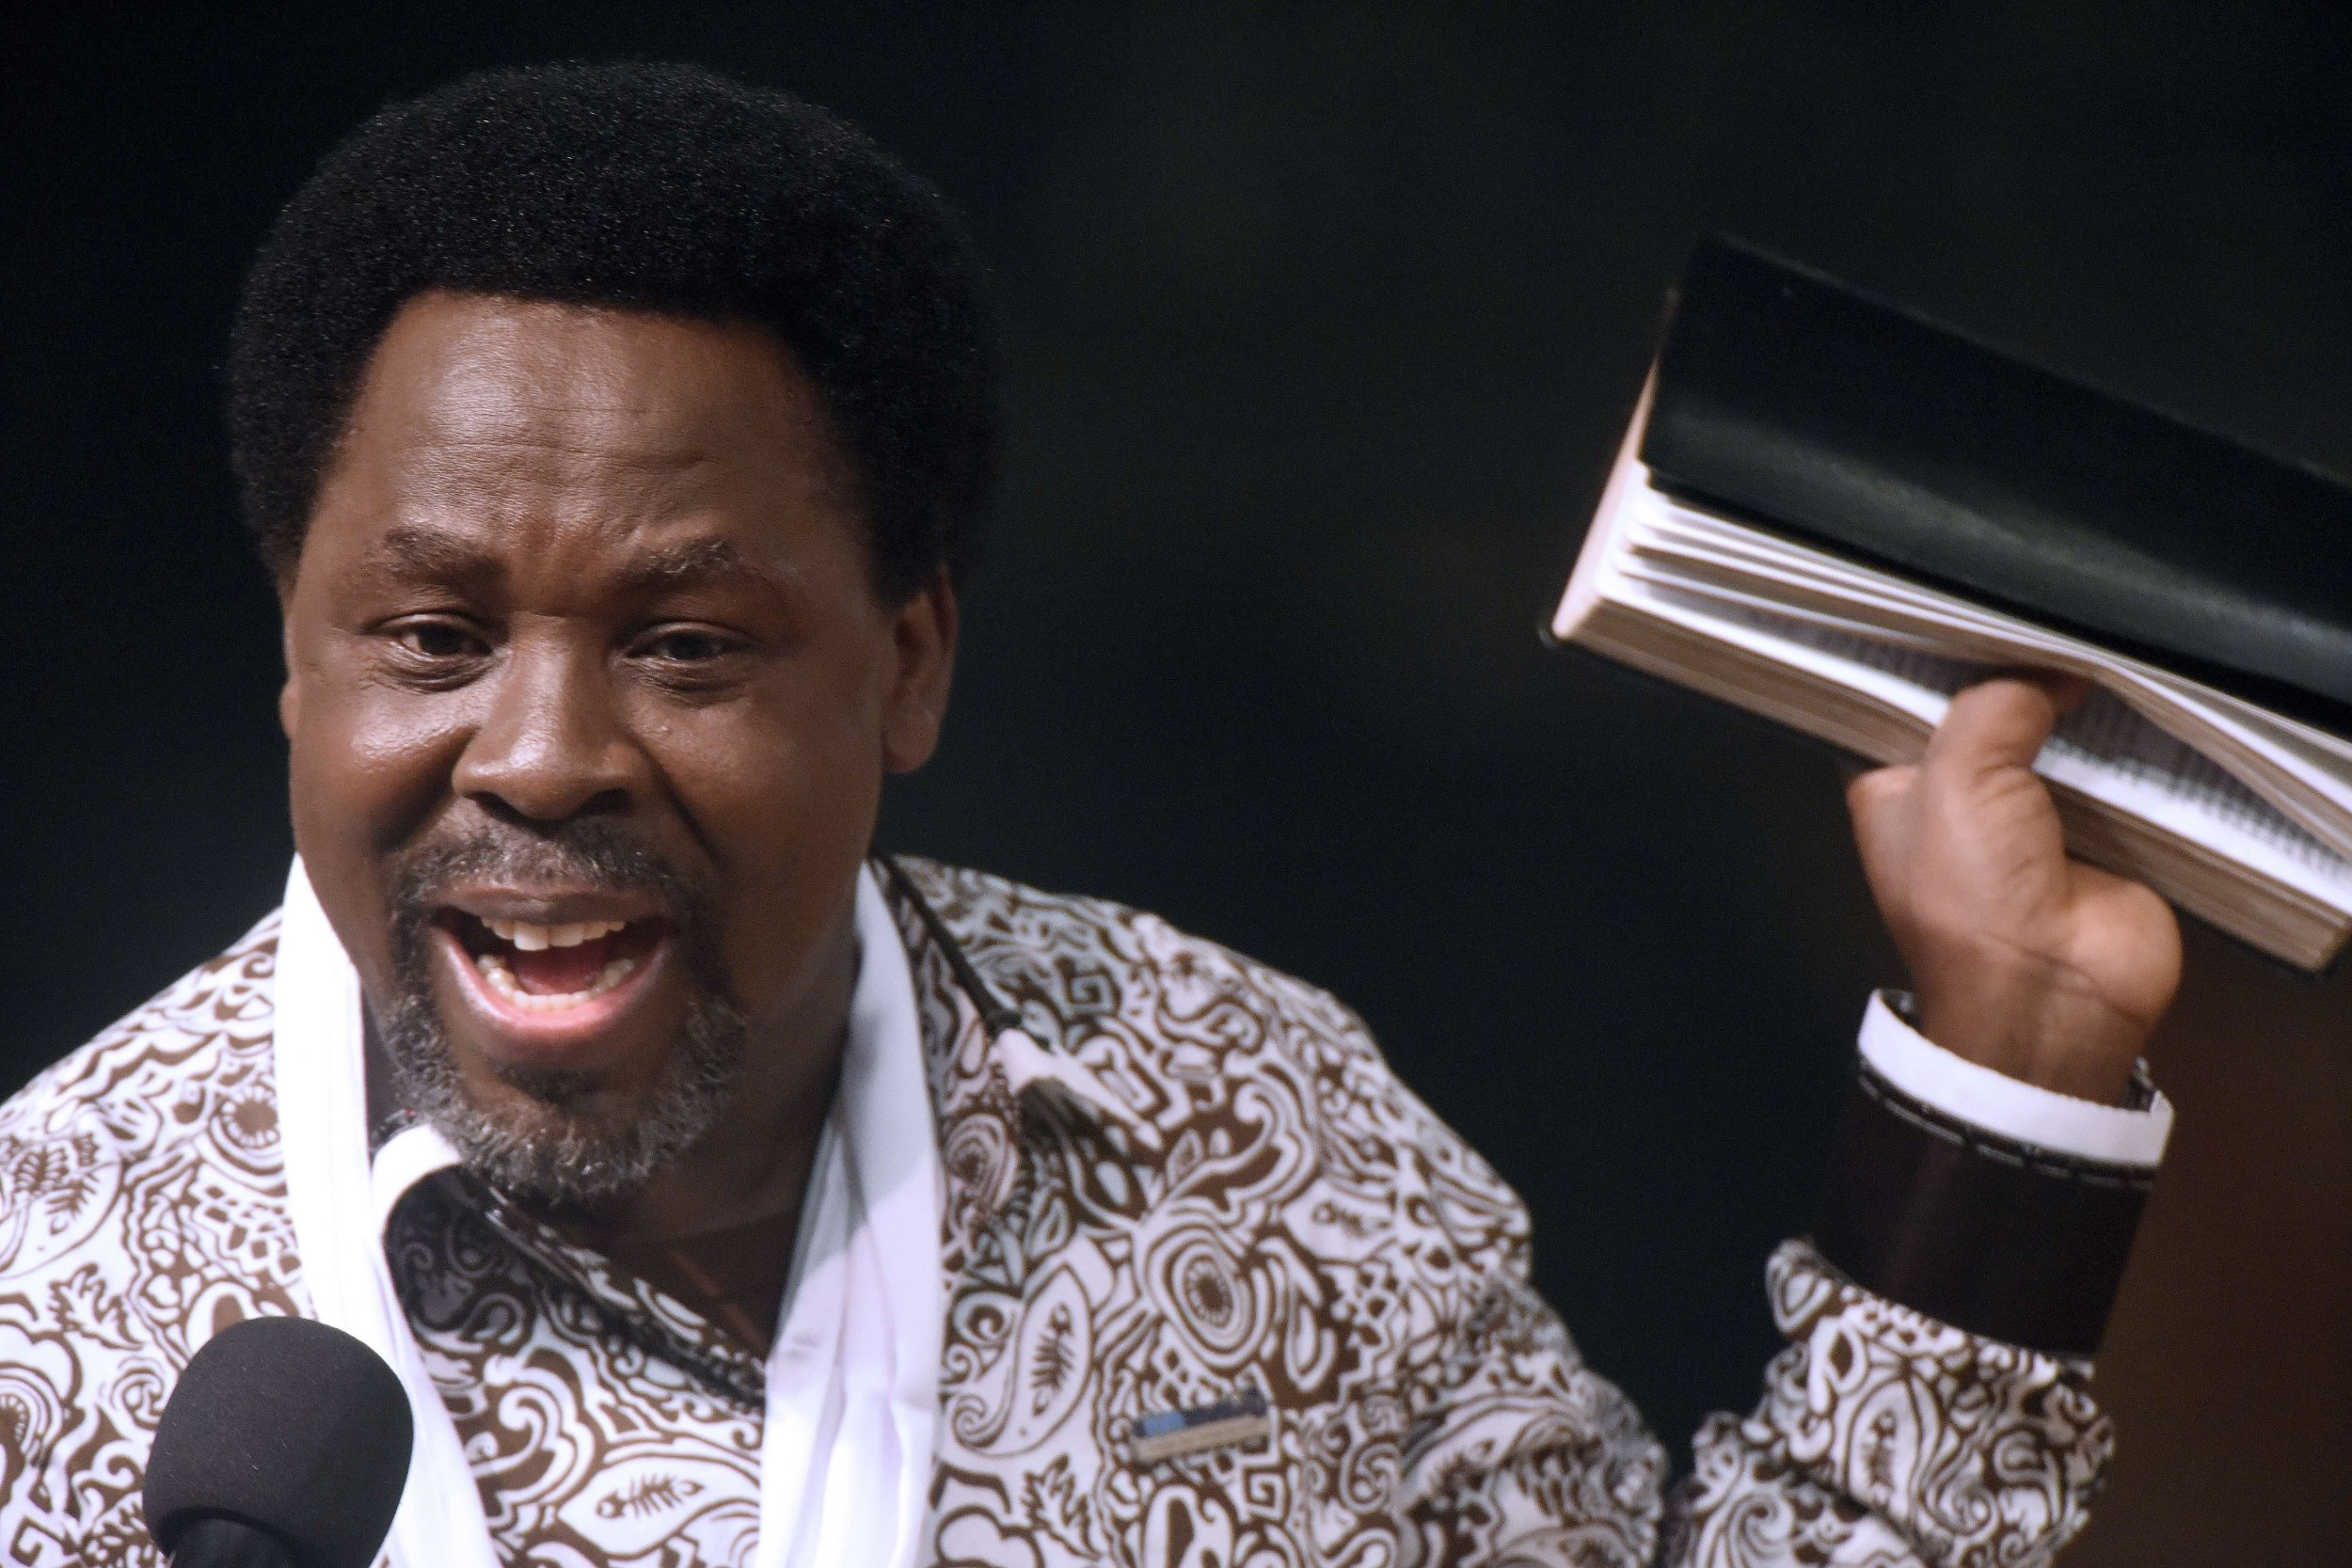 www.tvn.hu imagesize:1440x960  Who is TB Joshua, Nigeria's Mega Preacher Accused of Criminal Negligence?